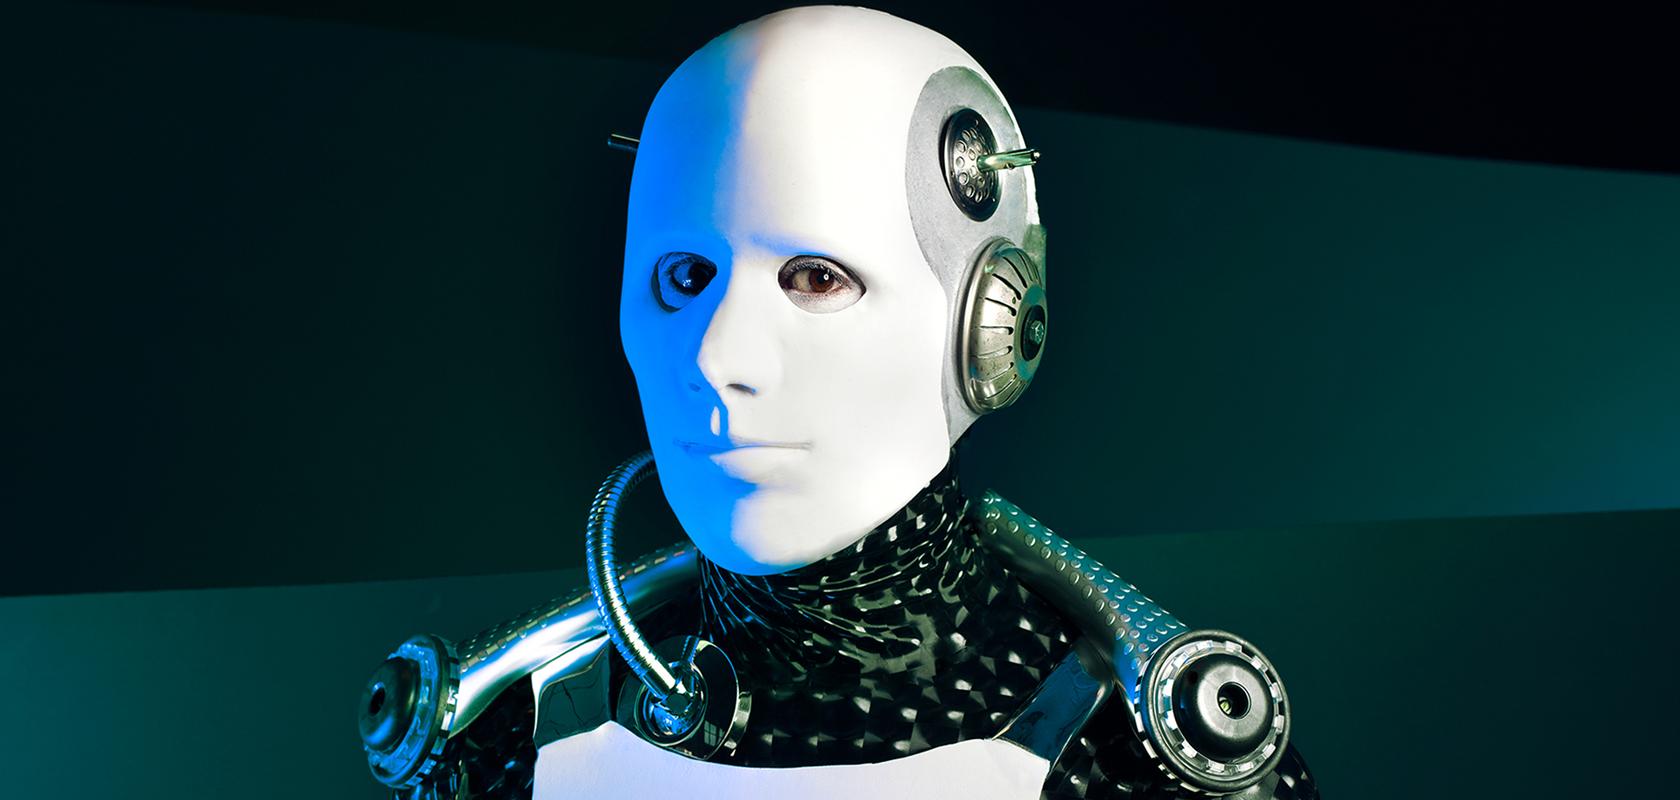 Robot-Campagnebeeld